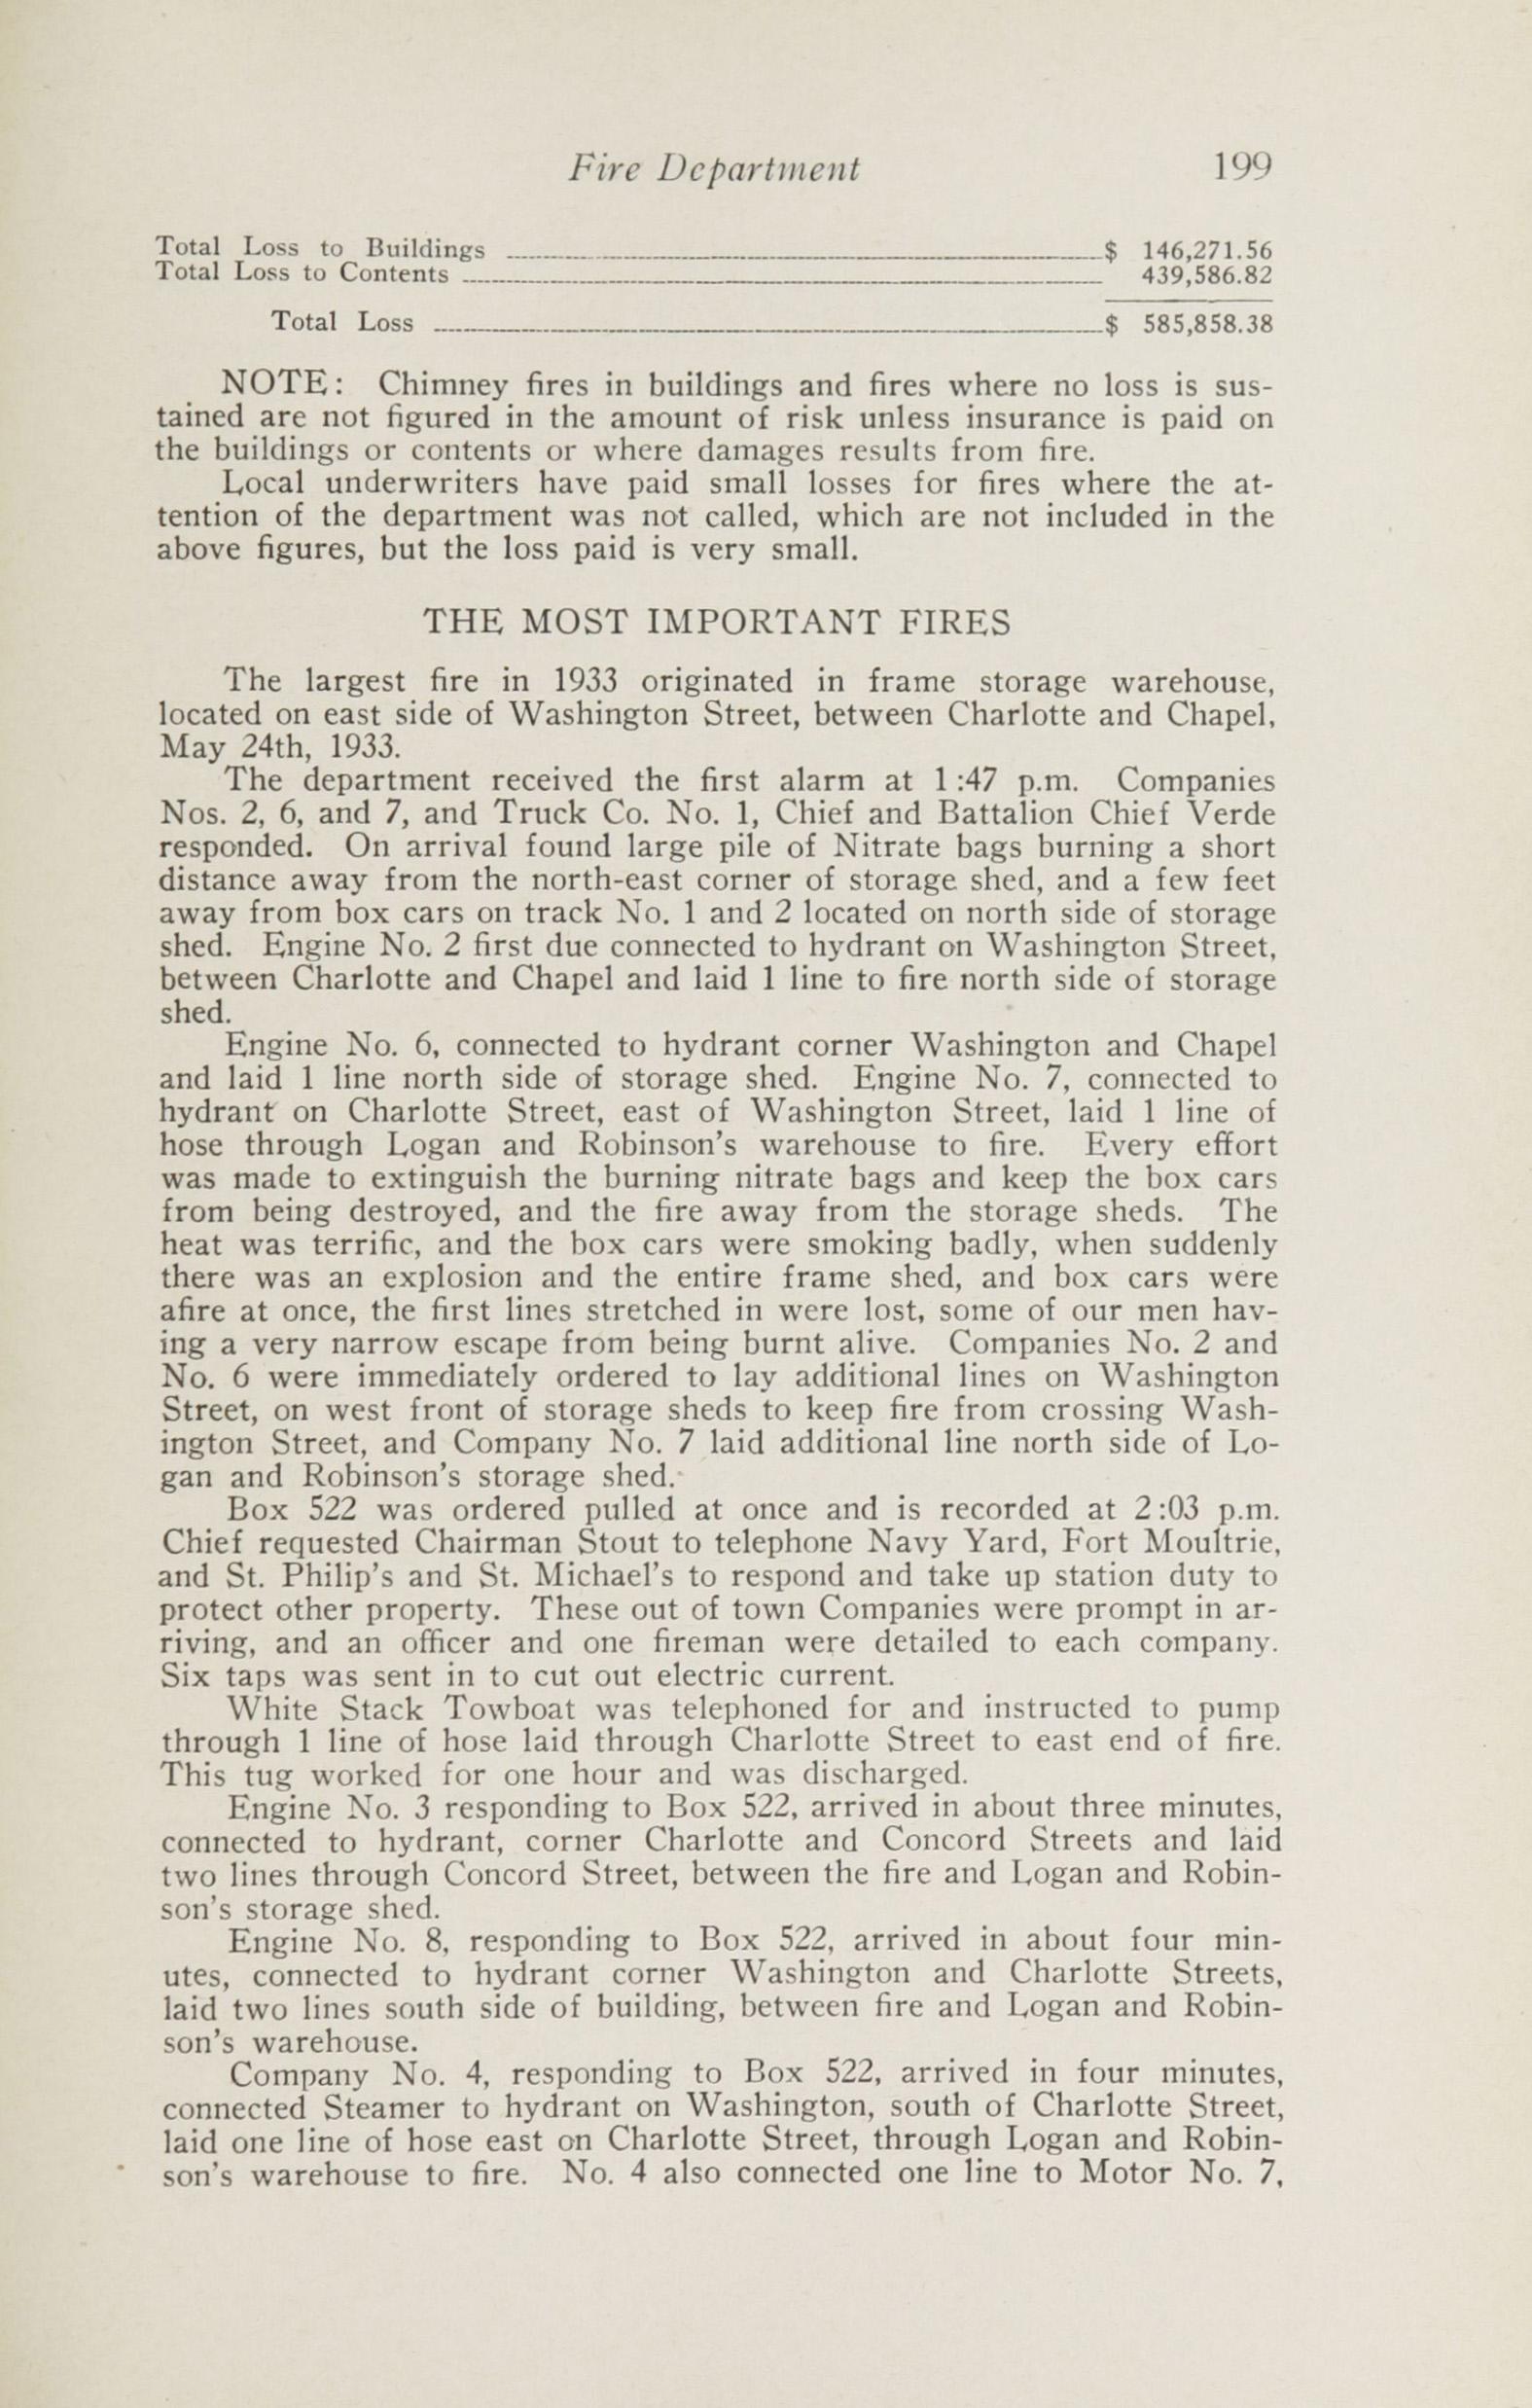 Charleston Yearbook, 1932-1935, page 199